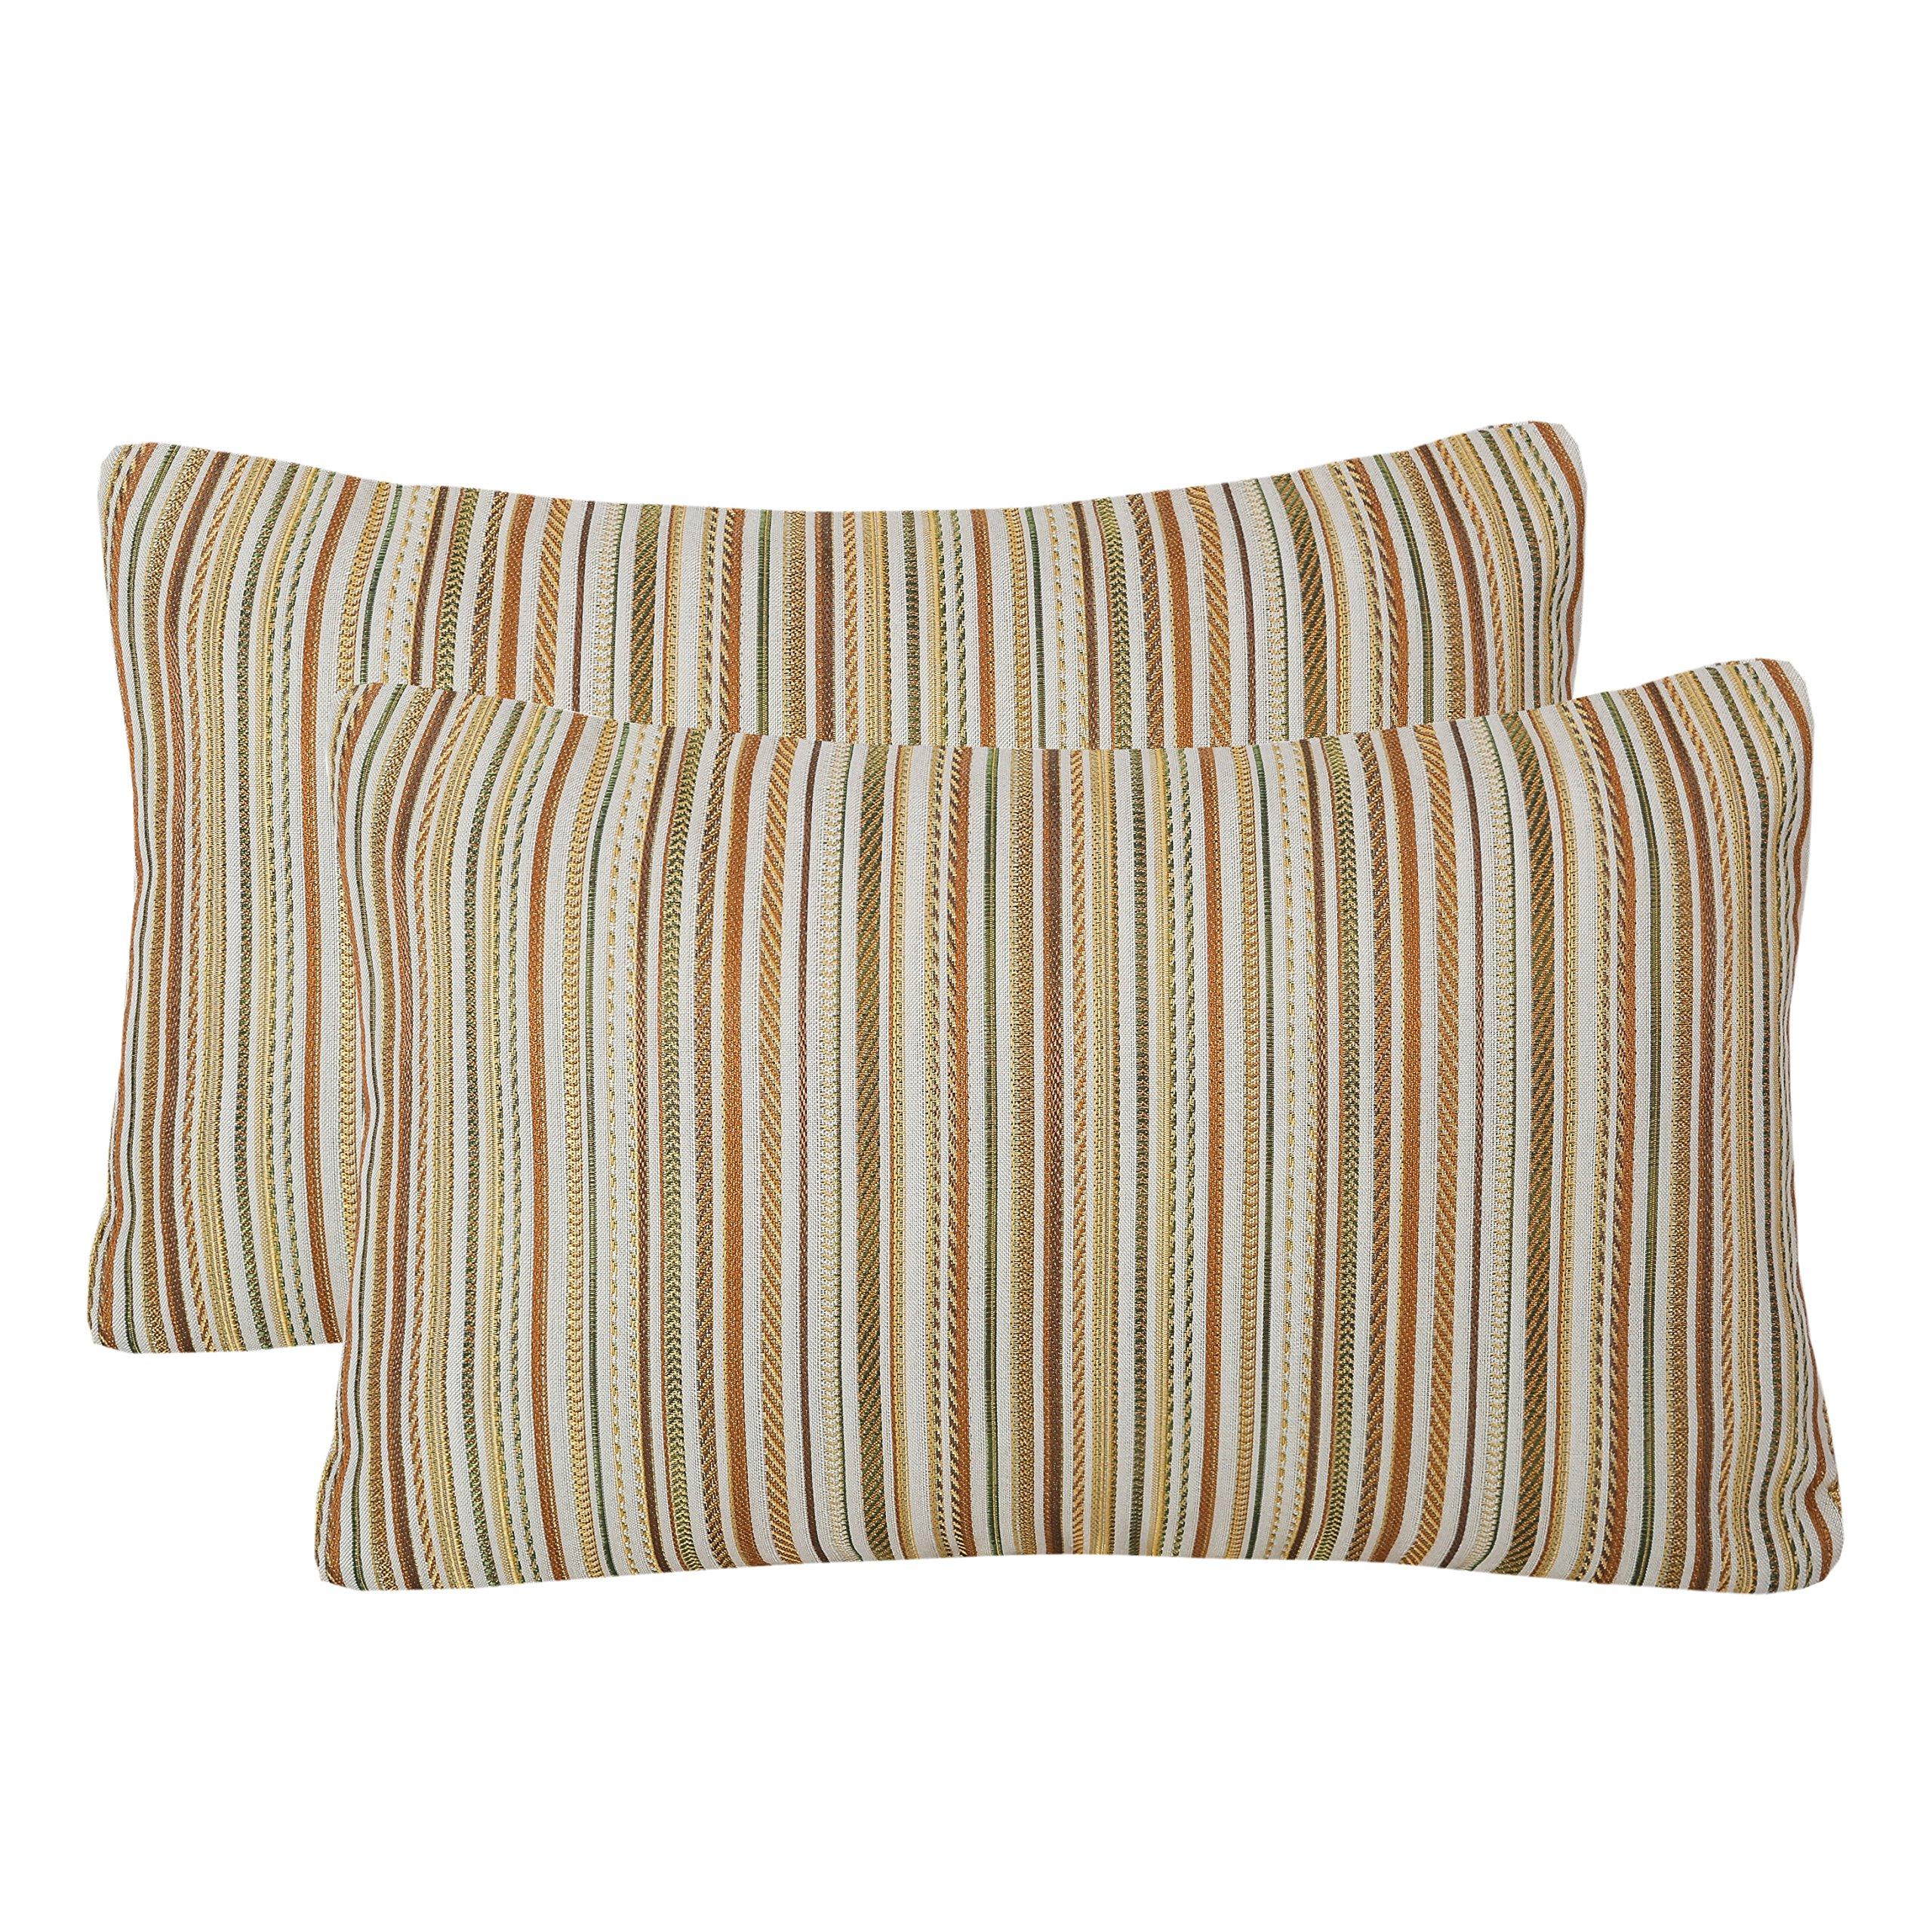 Simpledecor Jacquard Colorful Stripes Multicolor